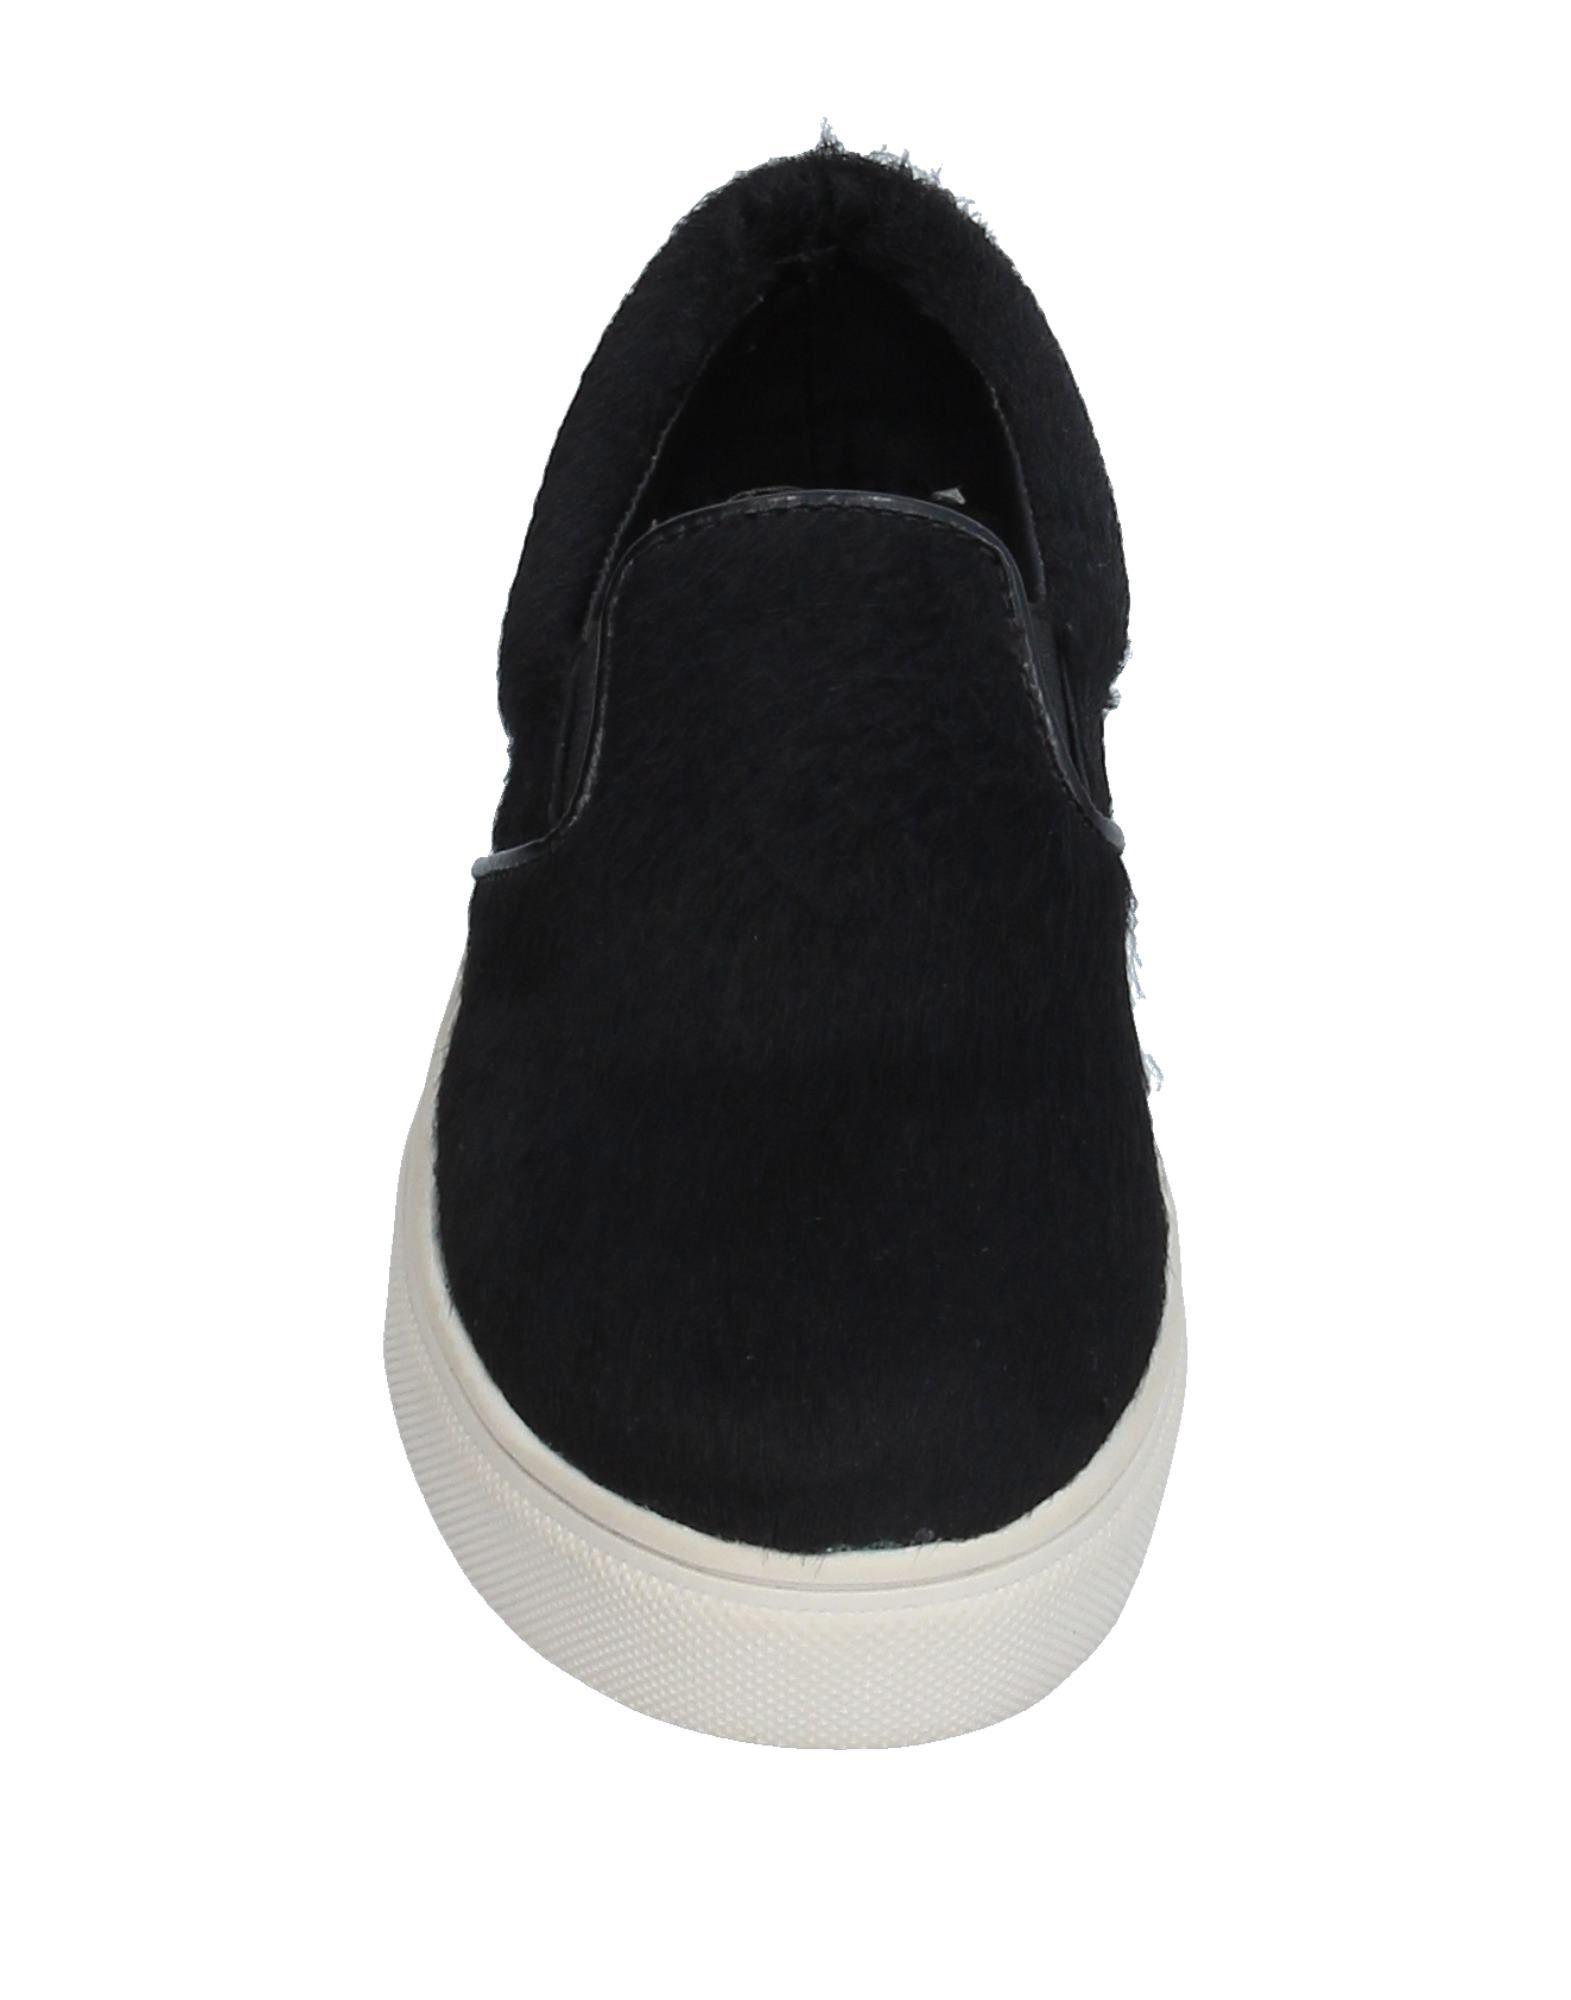 Steve Madden Sneakers lohnt Damen Gutes Preis-Leistungs-Verhältnis, es lohnt Sneakers sich 7670 cc866f